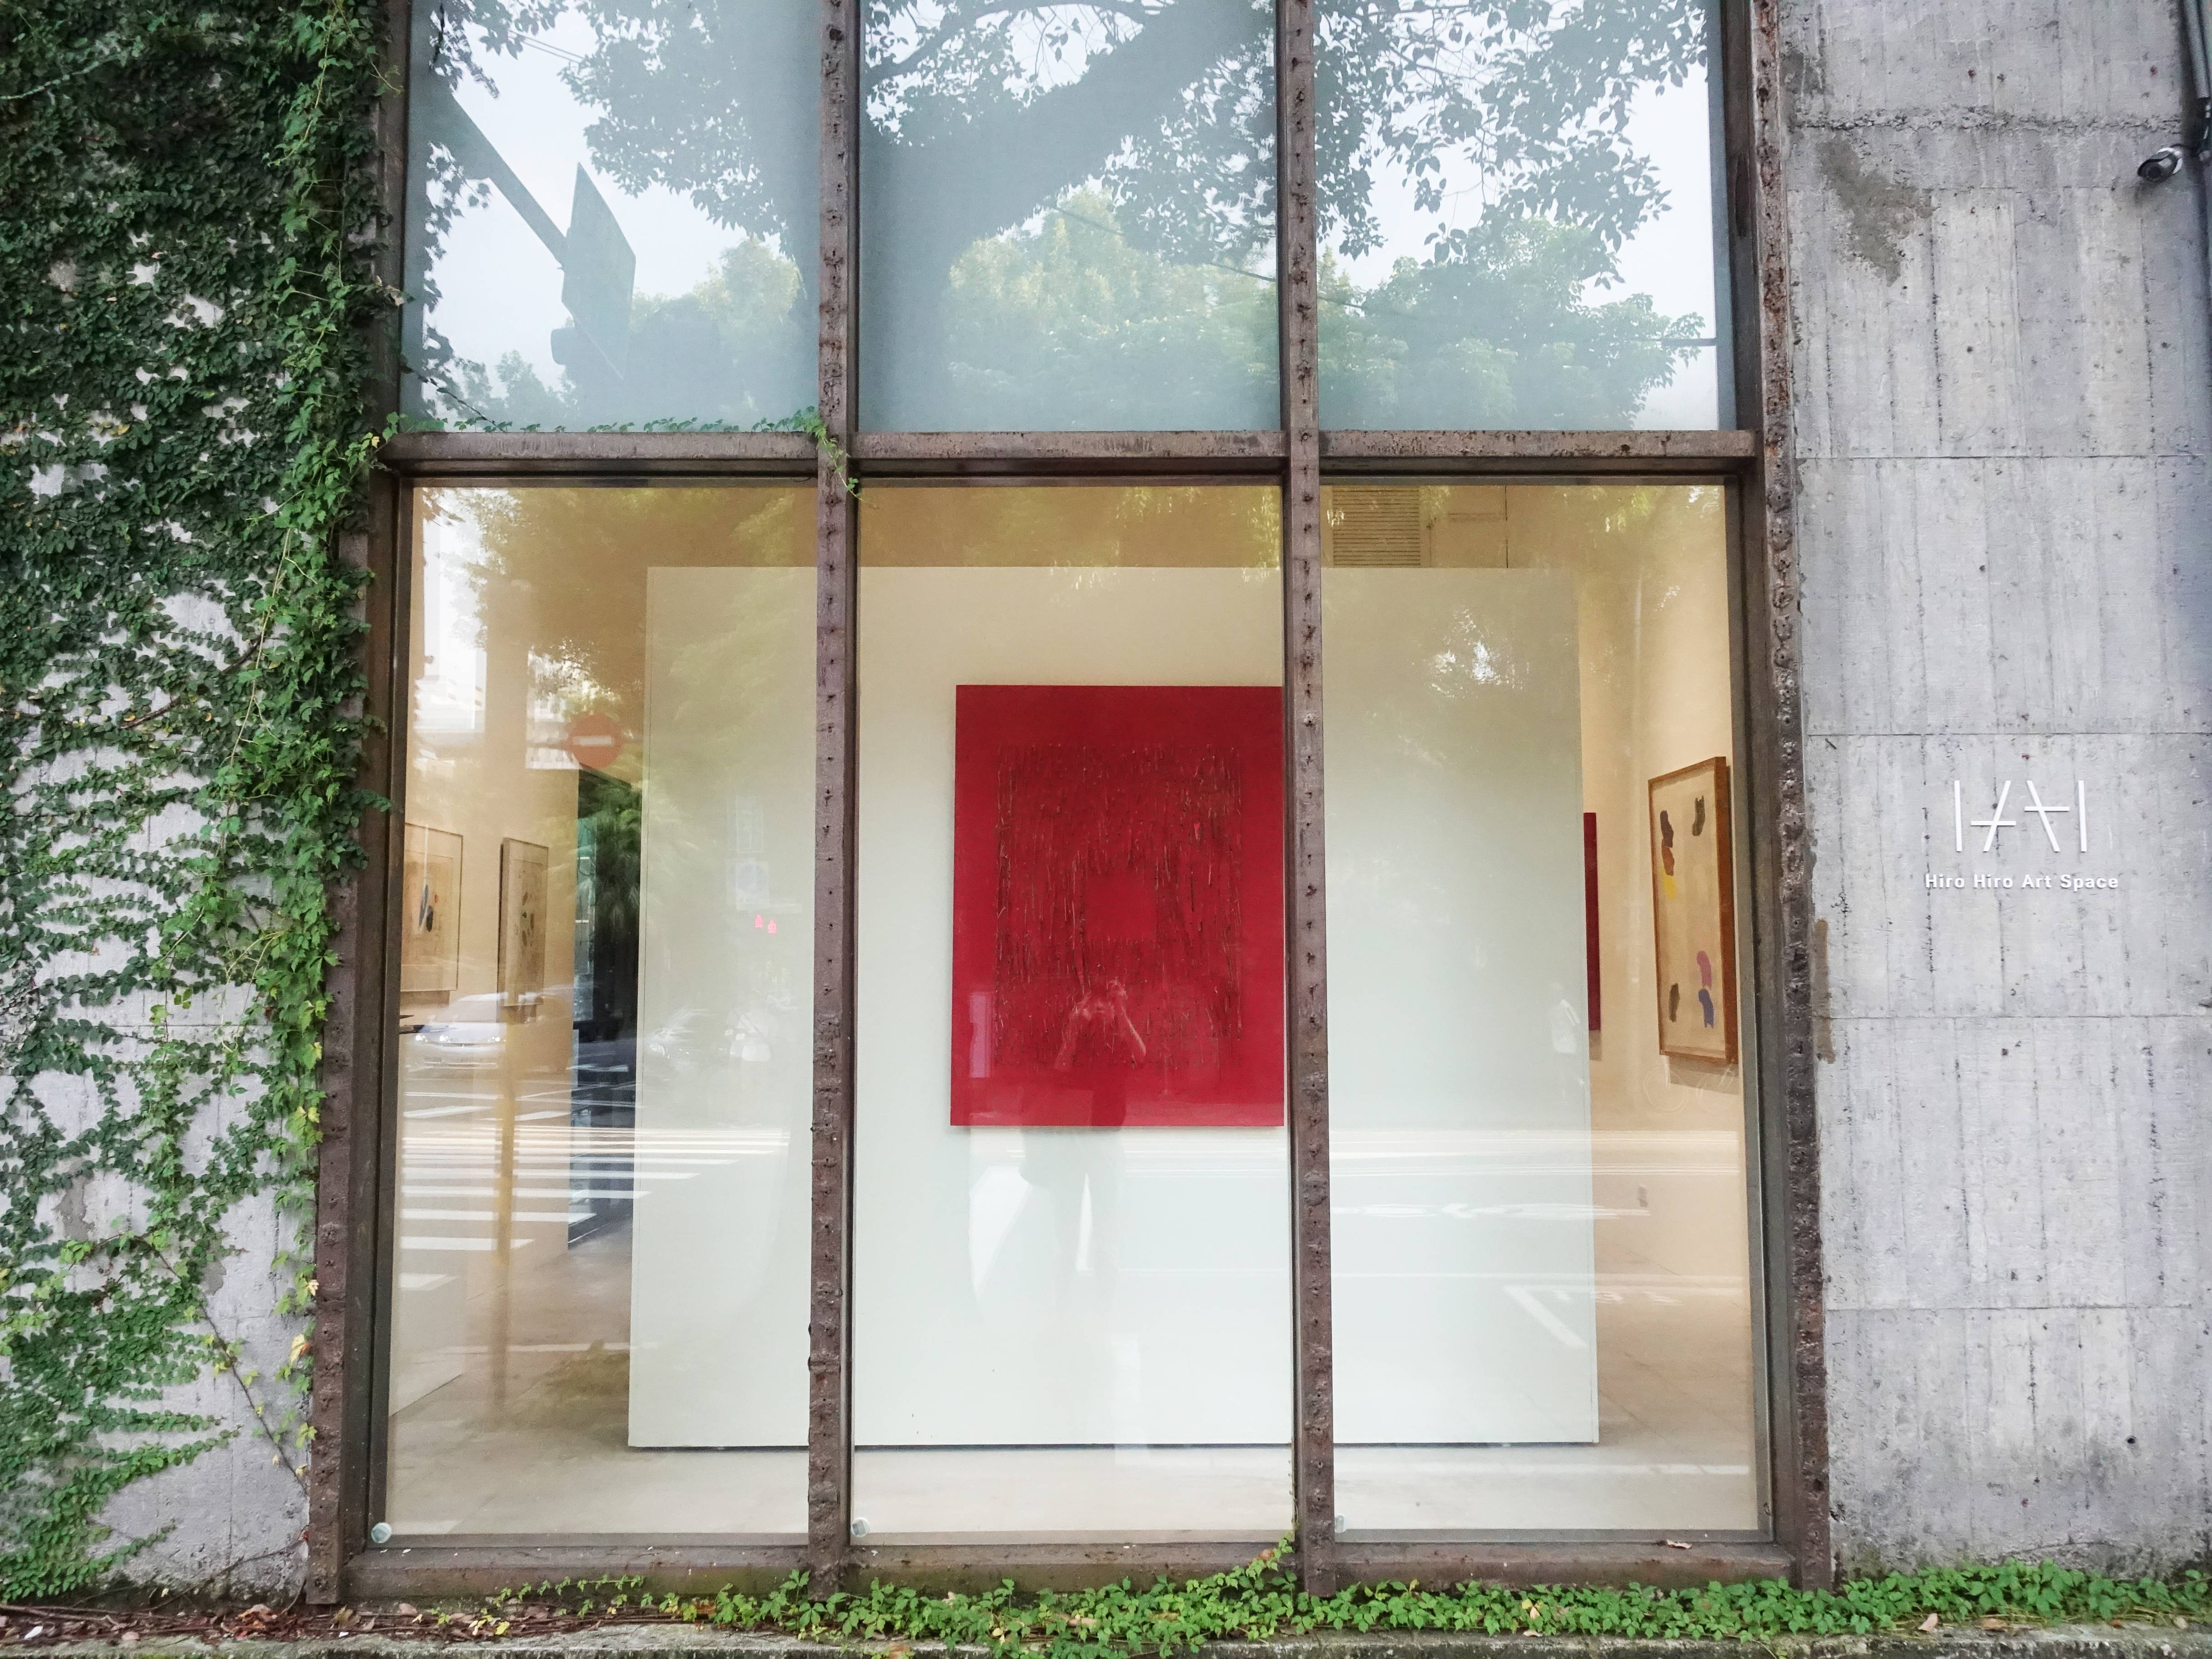 Hiro Hiro Art Space 畫廊外觀。